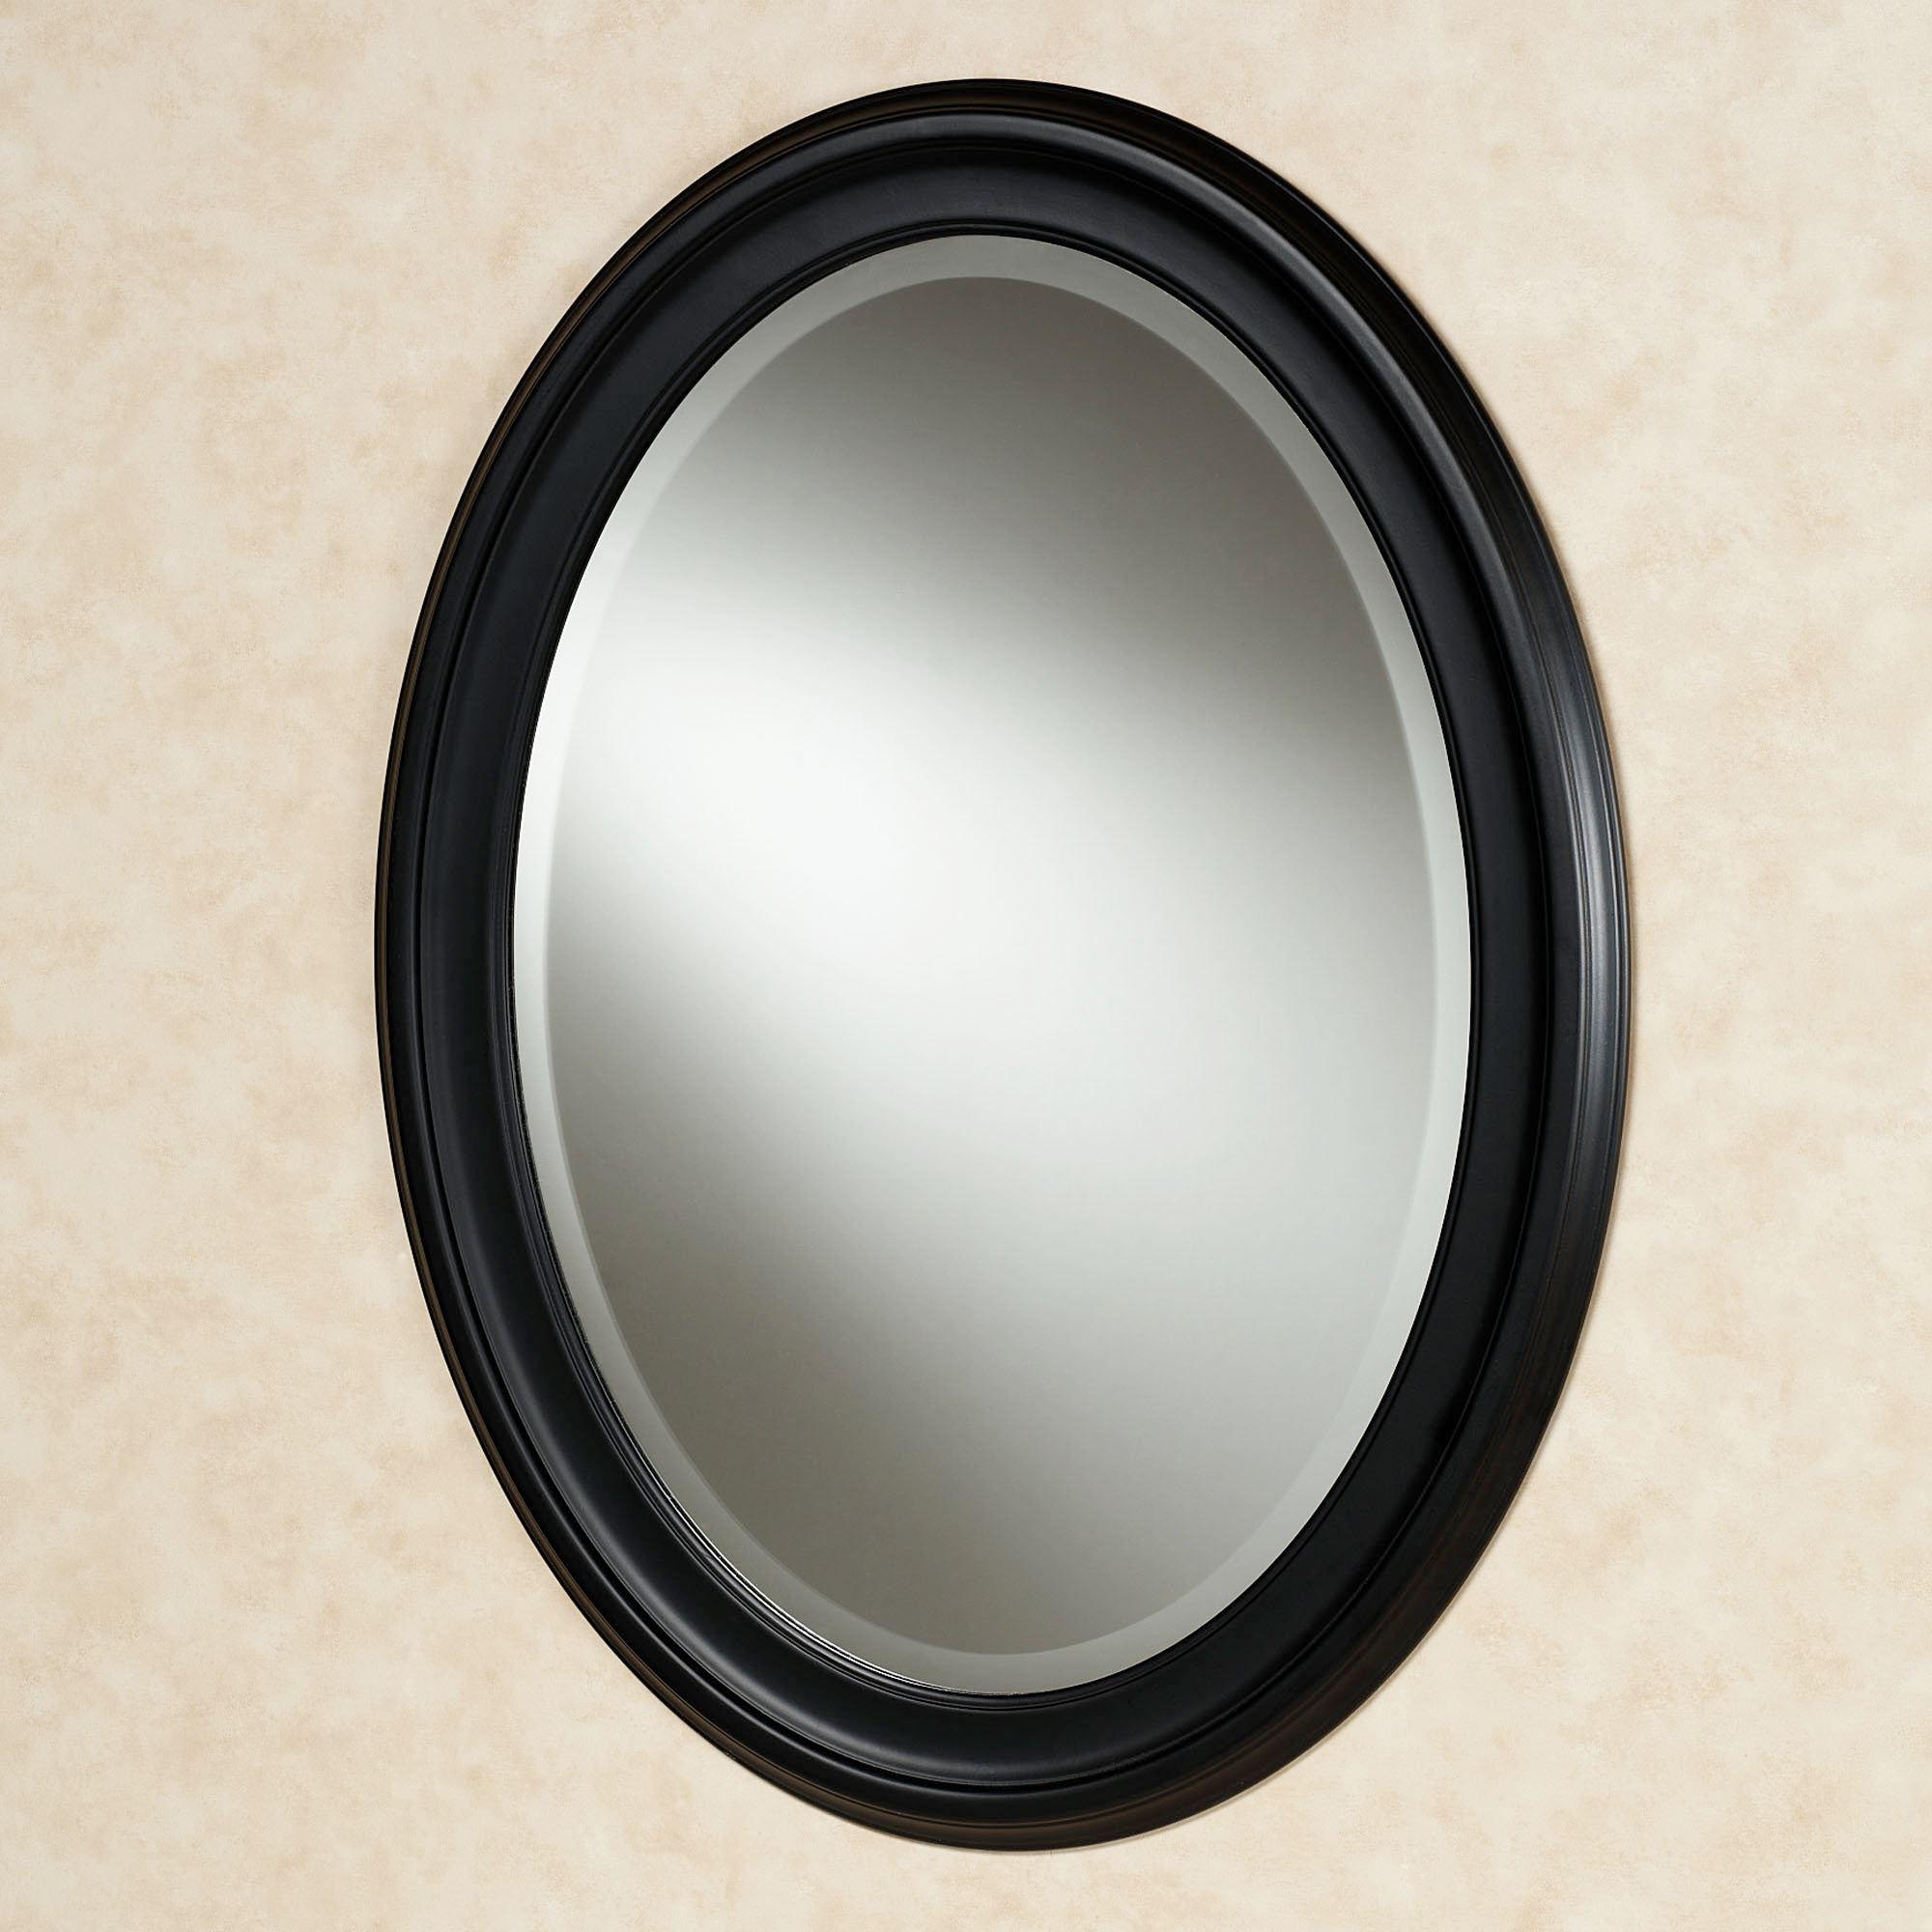 Most Recent Loree Black Oval Wall Mirror Inside Black Oval Wall Mirrors (View 2 of 20)